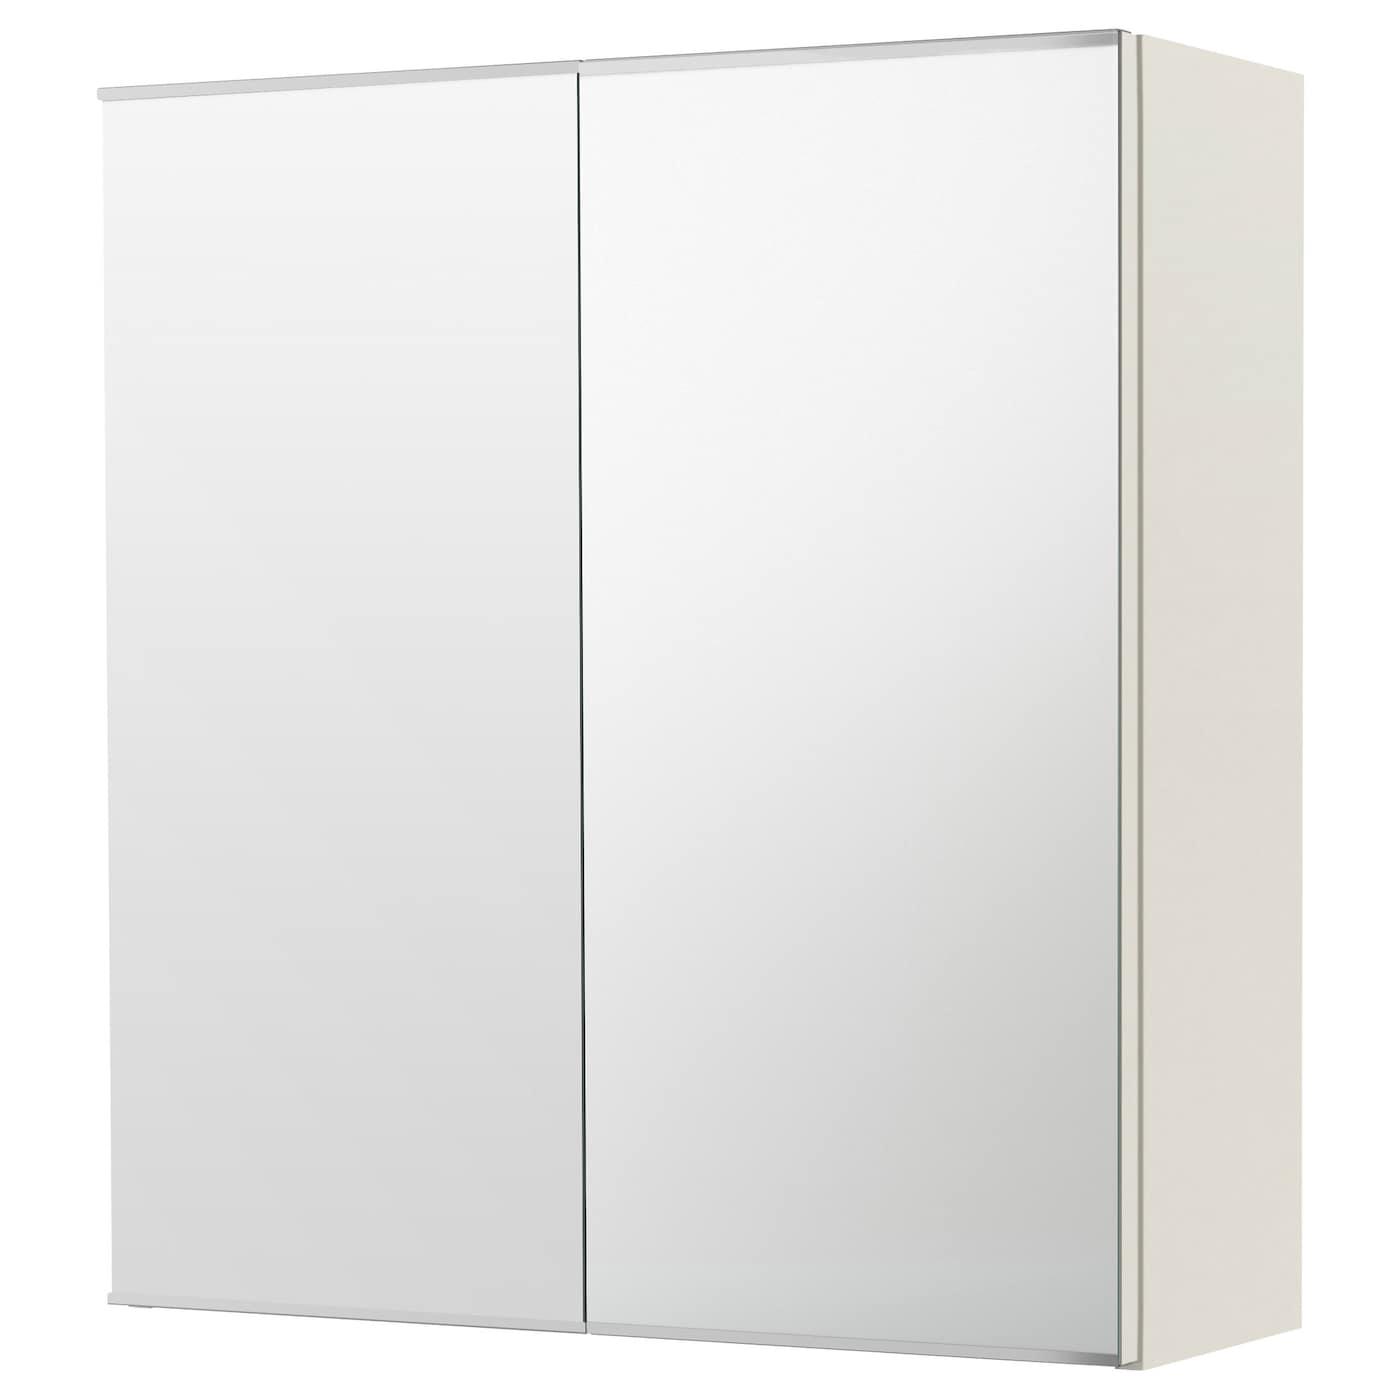 LILLÅNGEN Armario &espejo, 2 puertas Blanco 60 x 21 x 64 cm - IKEA